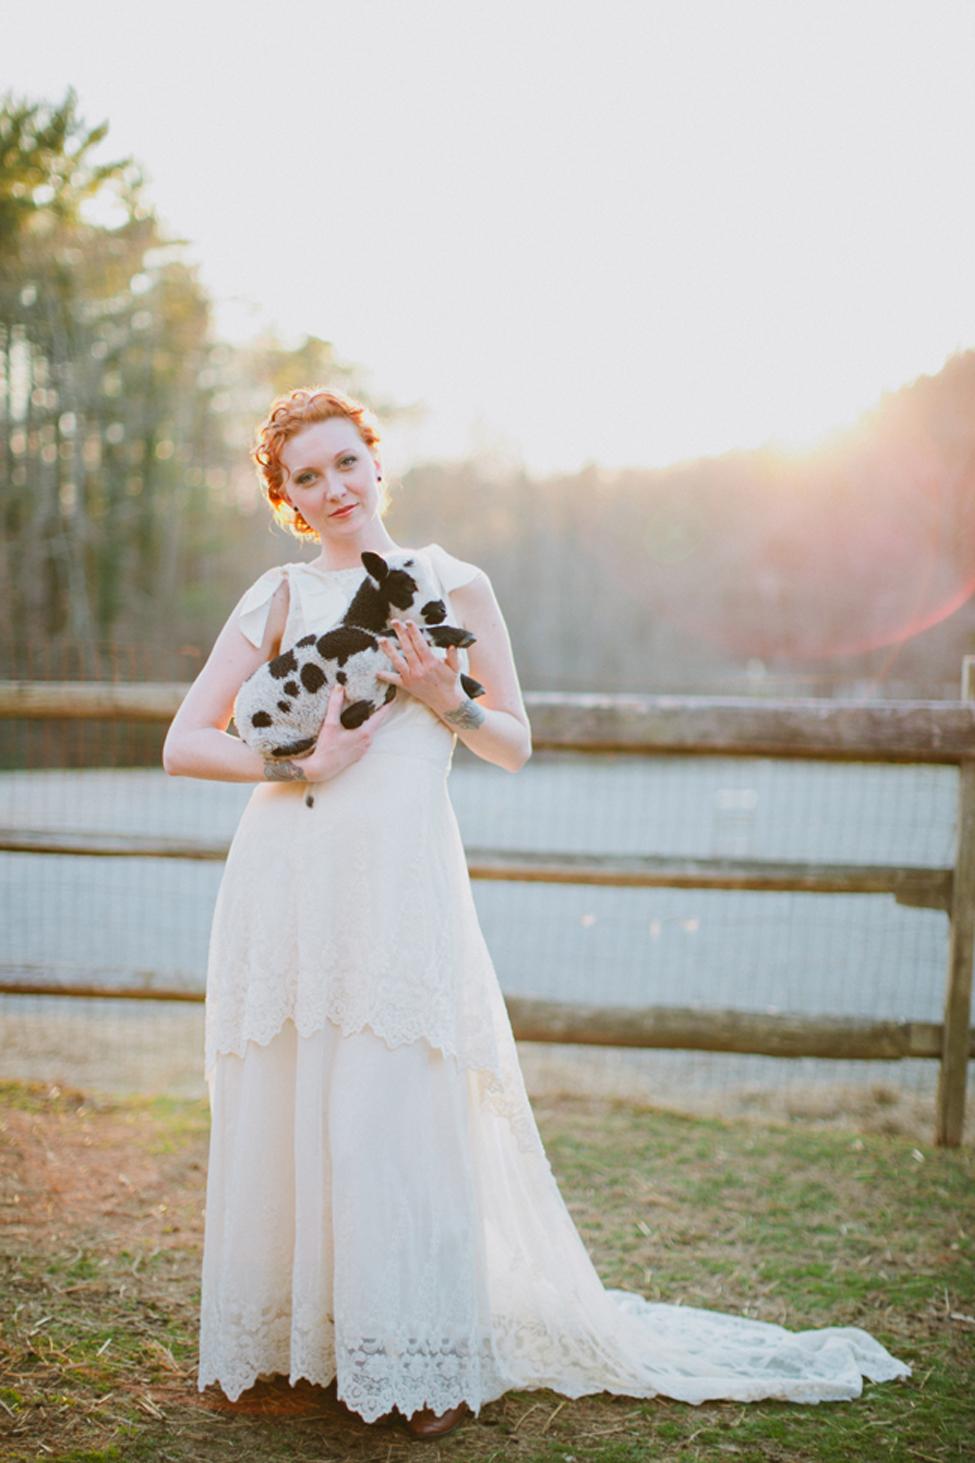 jameykay_arlie_folk_farm_wedding104.jpg